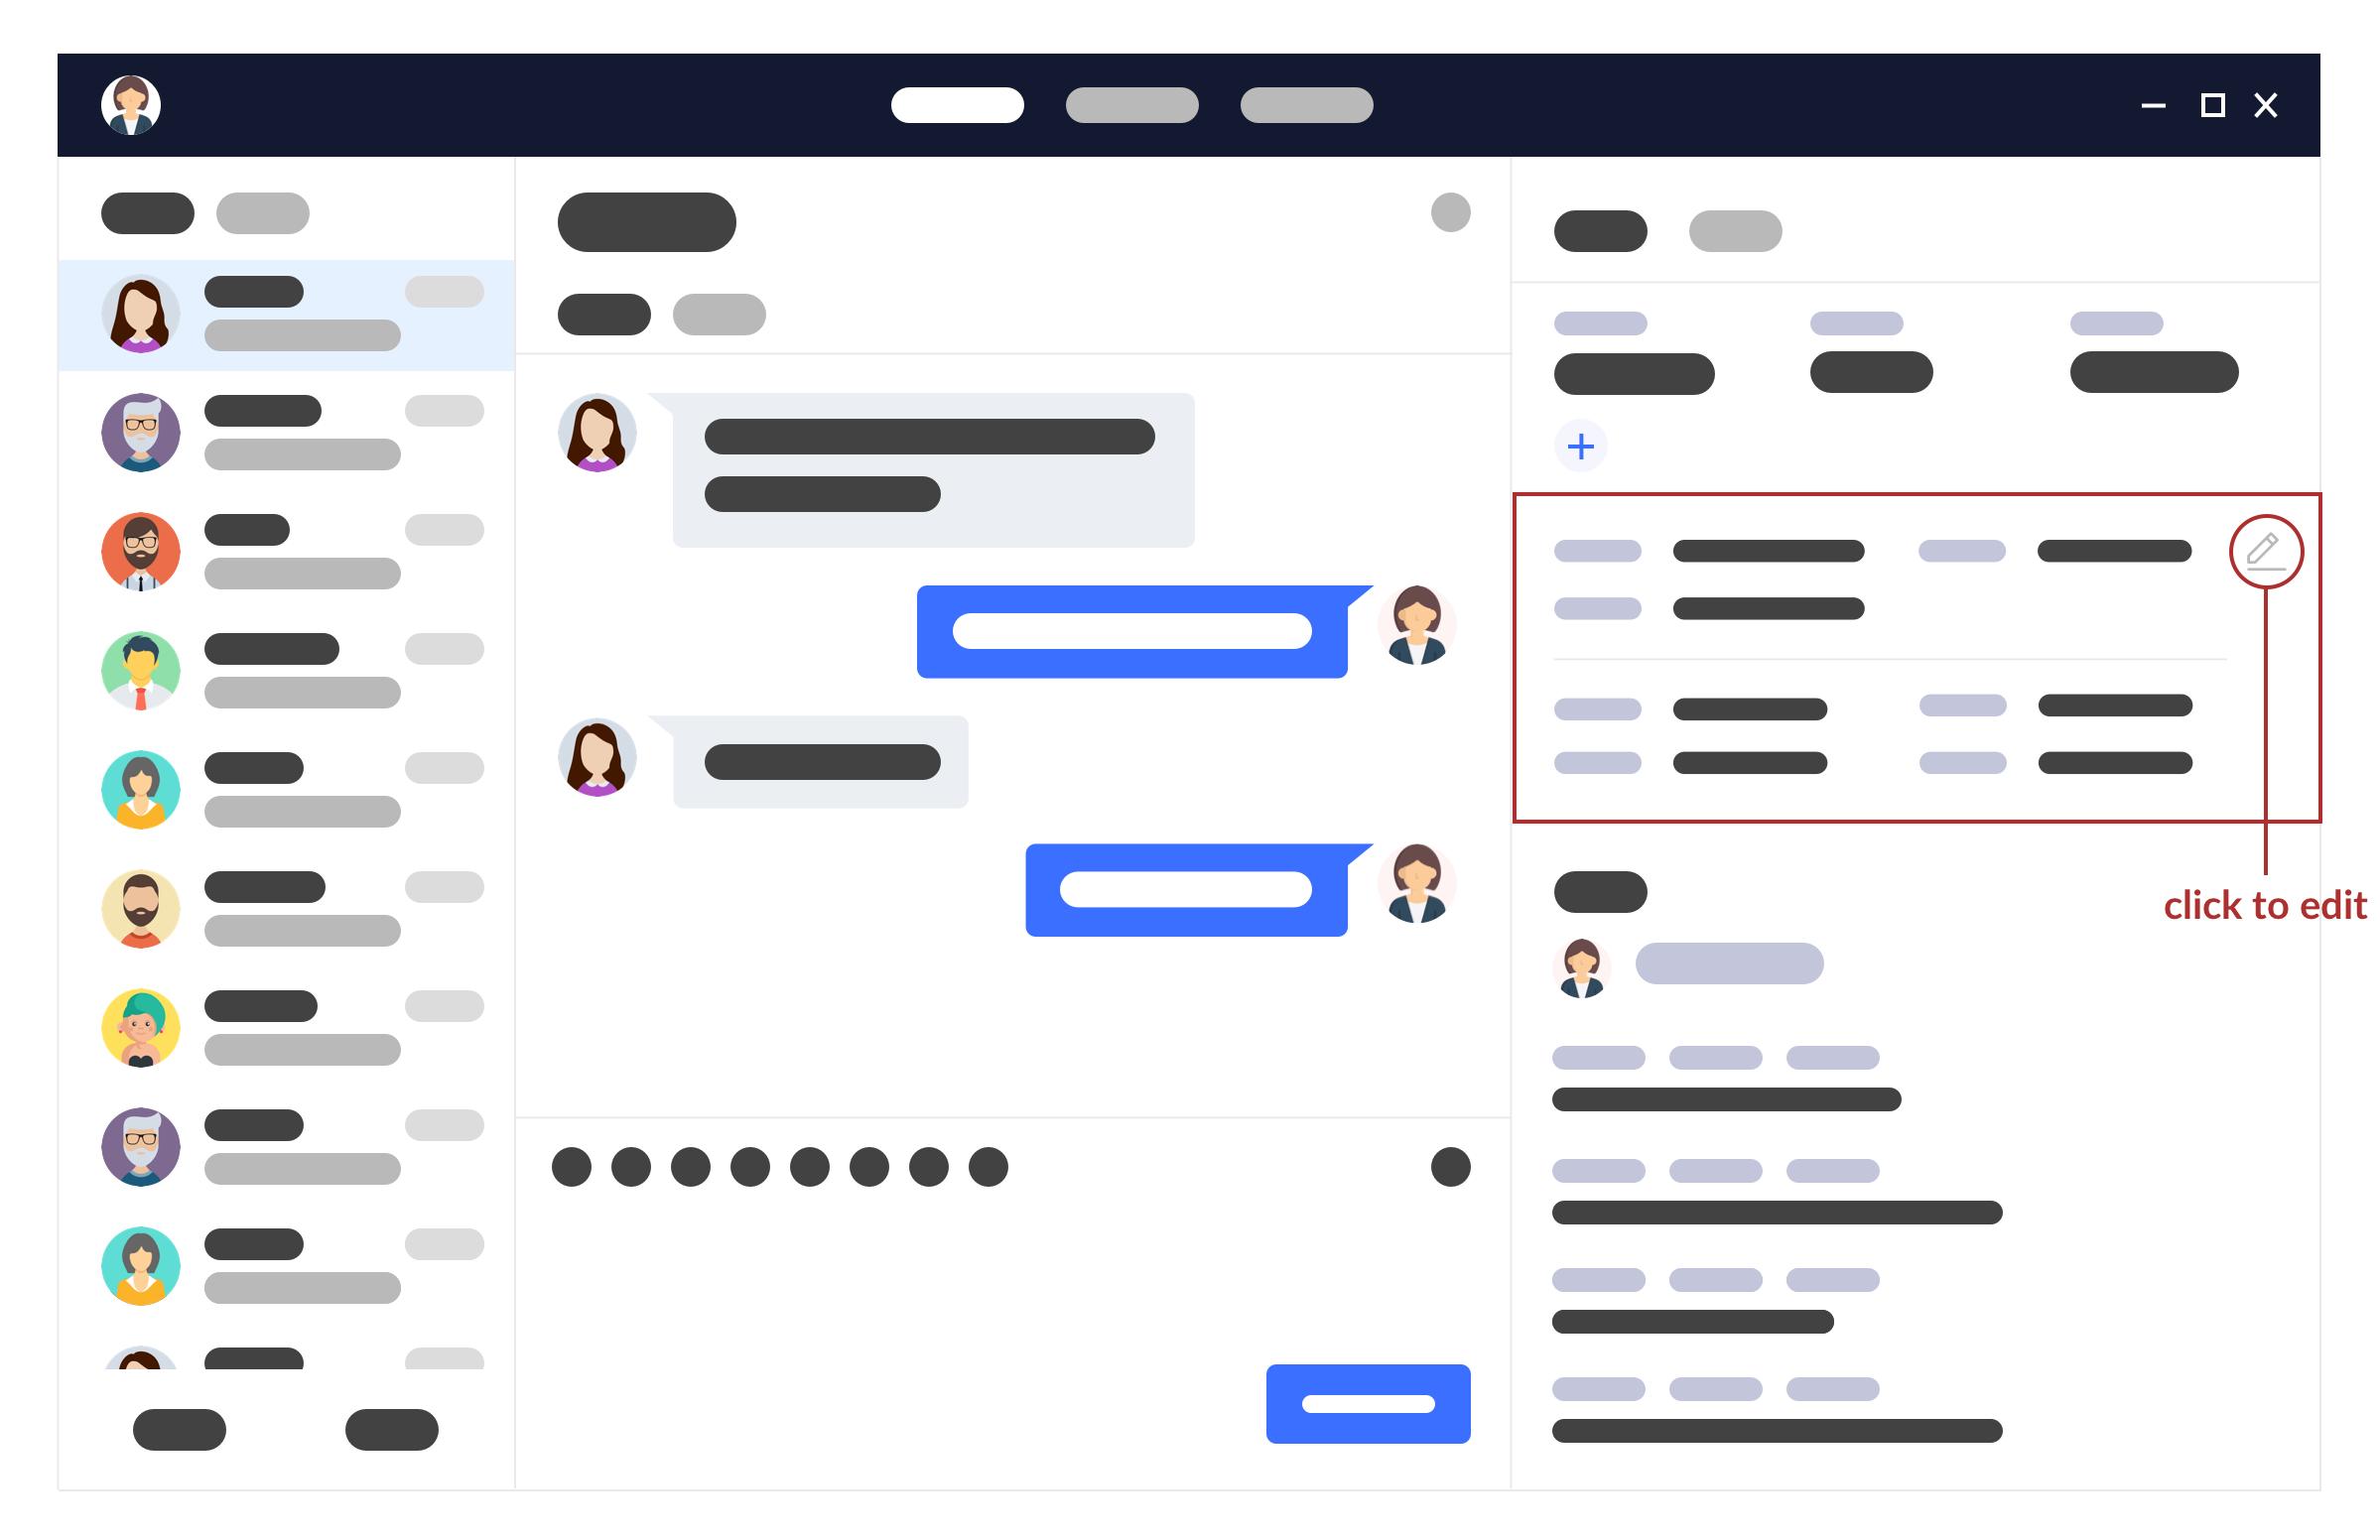 (Before: Messenger Platform - Editing Client's Info)